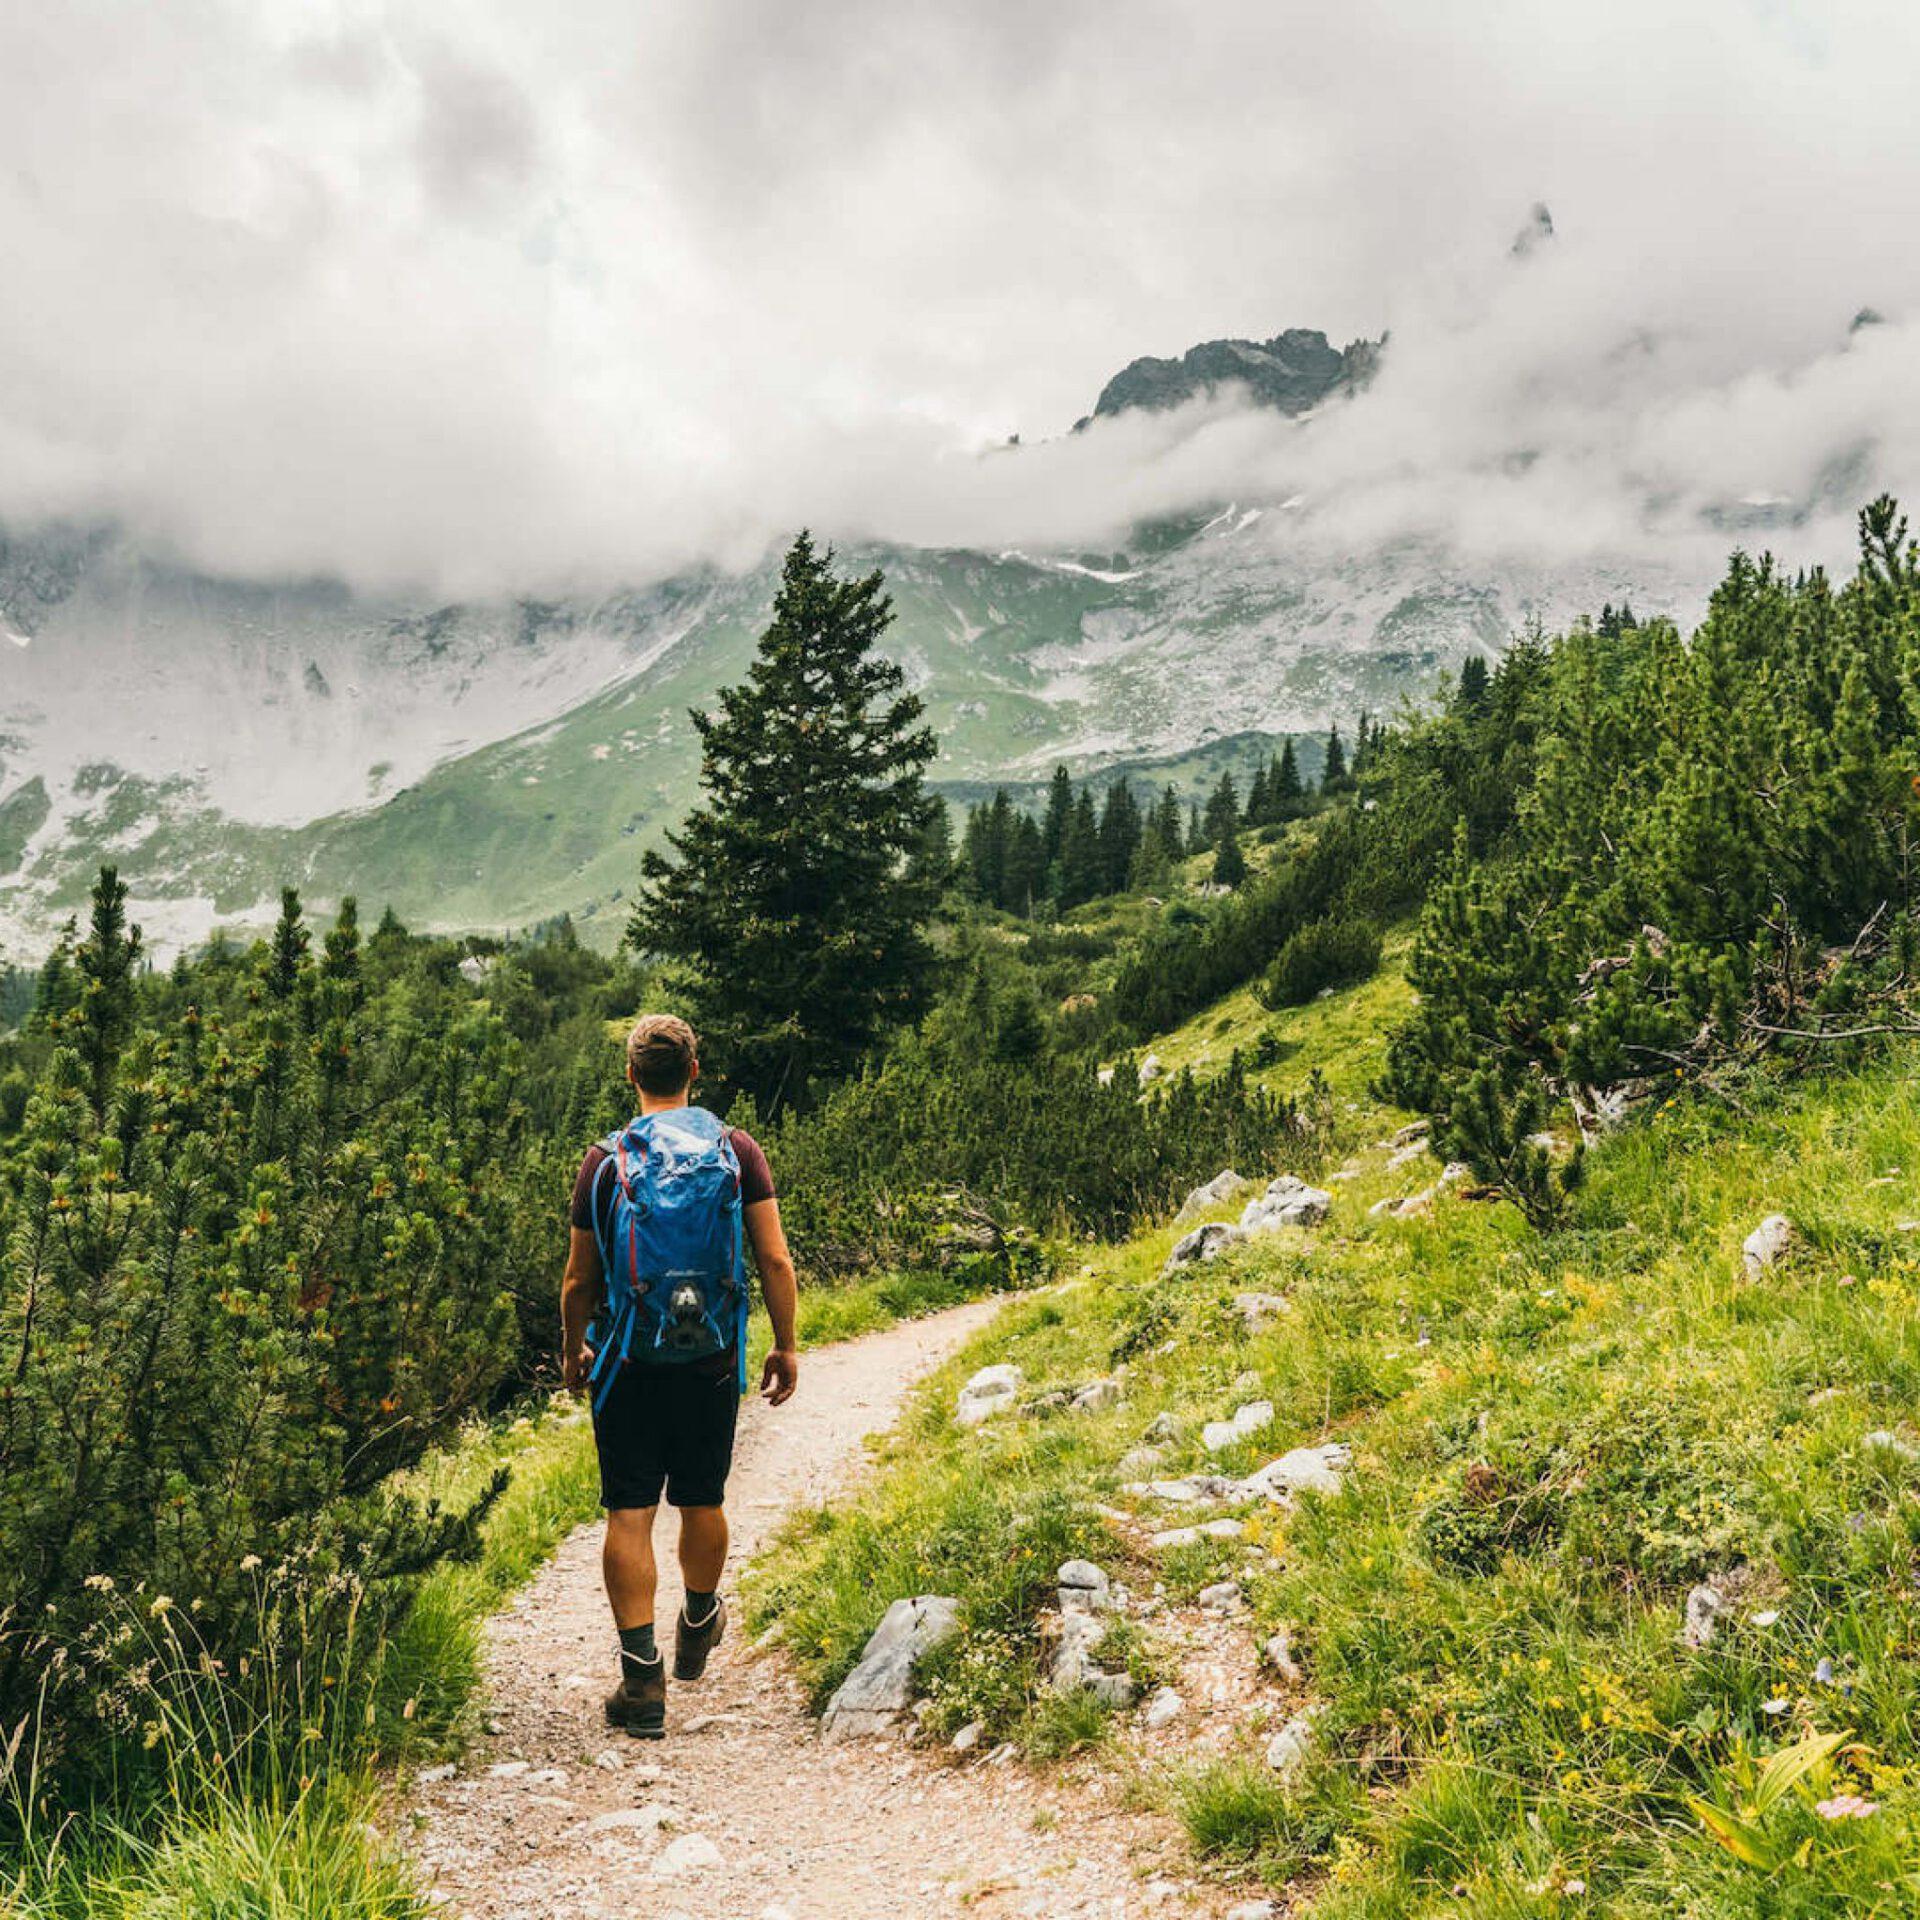 vorarlberg montafon gauertaler-alpkultourweg lindauer-hütte mann gauertal wandern